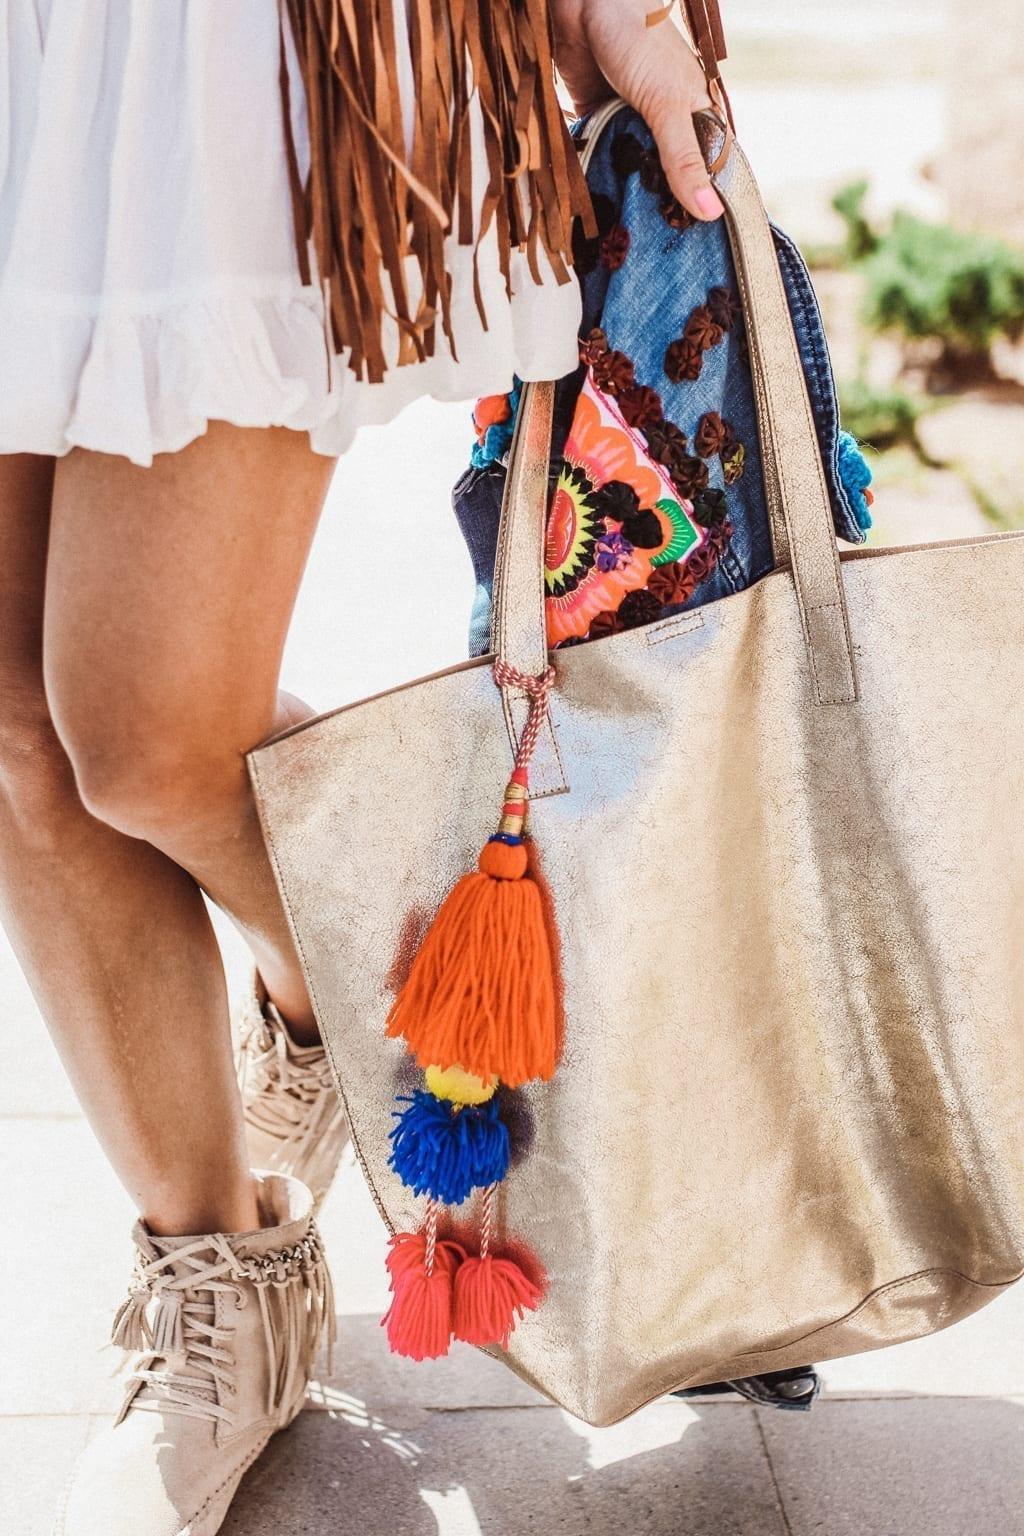 CK1605_Constantly-K-Karin-Kaswurm-Georg-Teigl-Ibiza-Holiday-Spain-Blog-Street-Style-Fashion-Boho-Chic-Beach-Style-7741